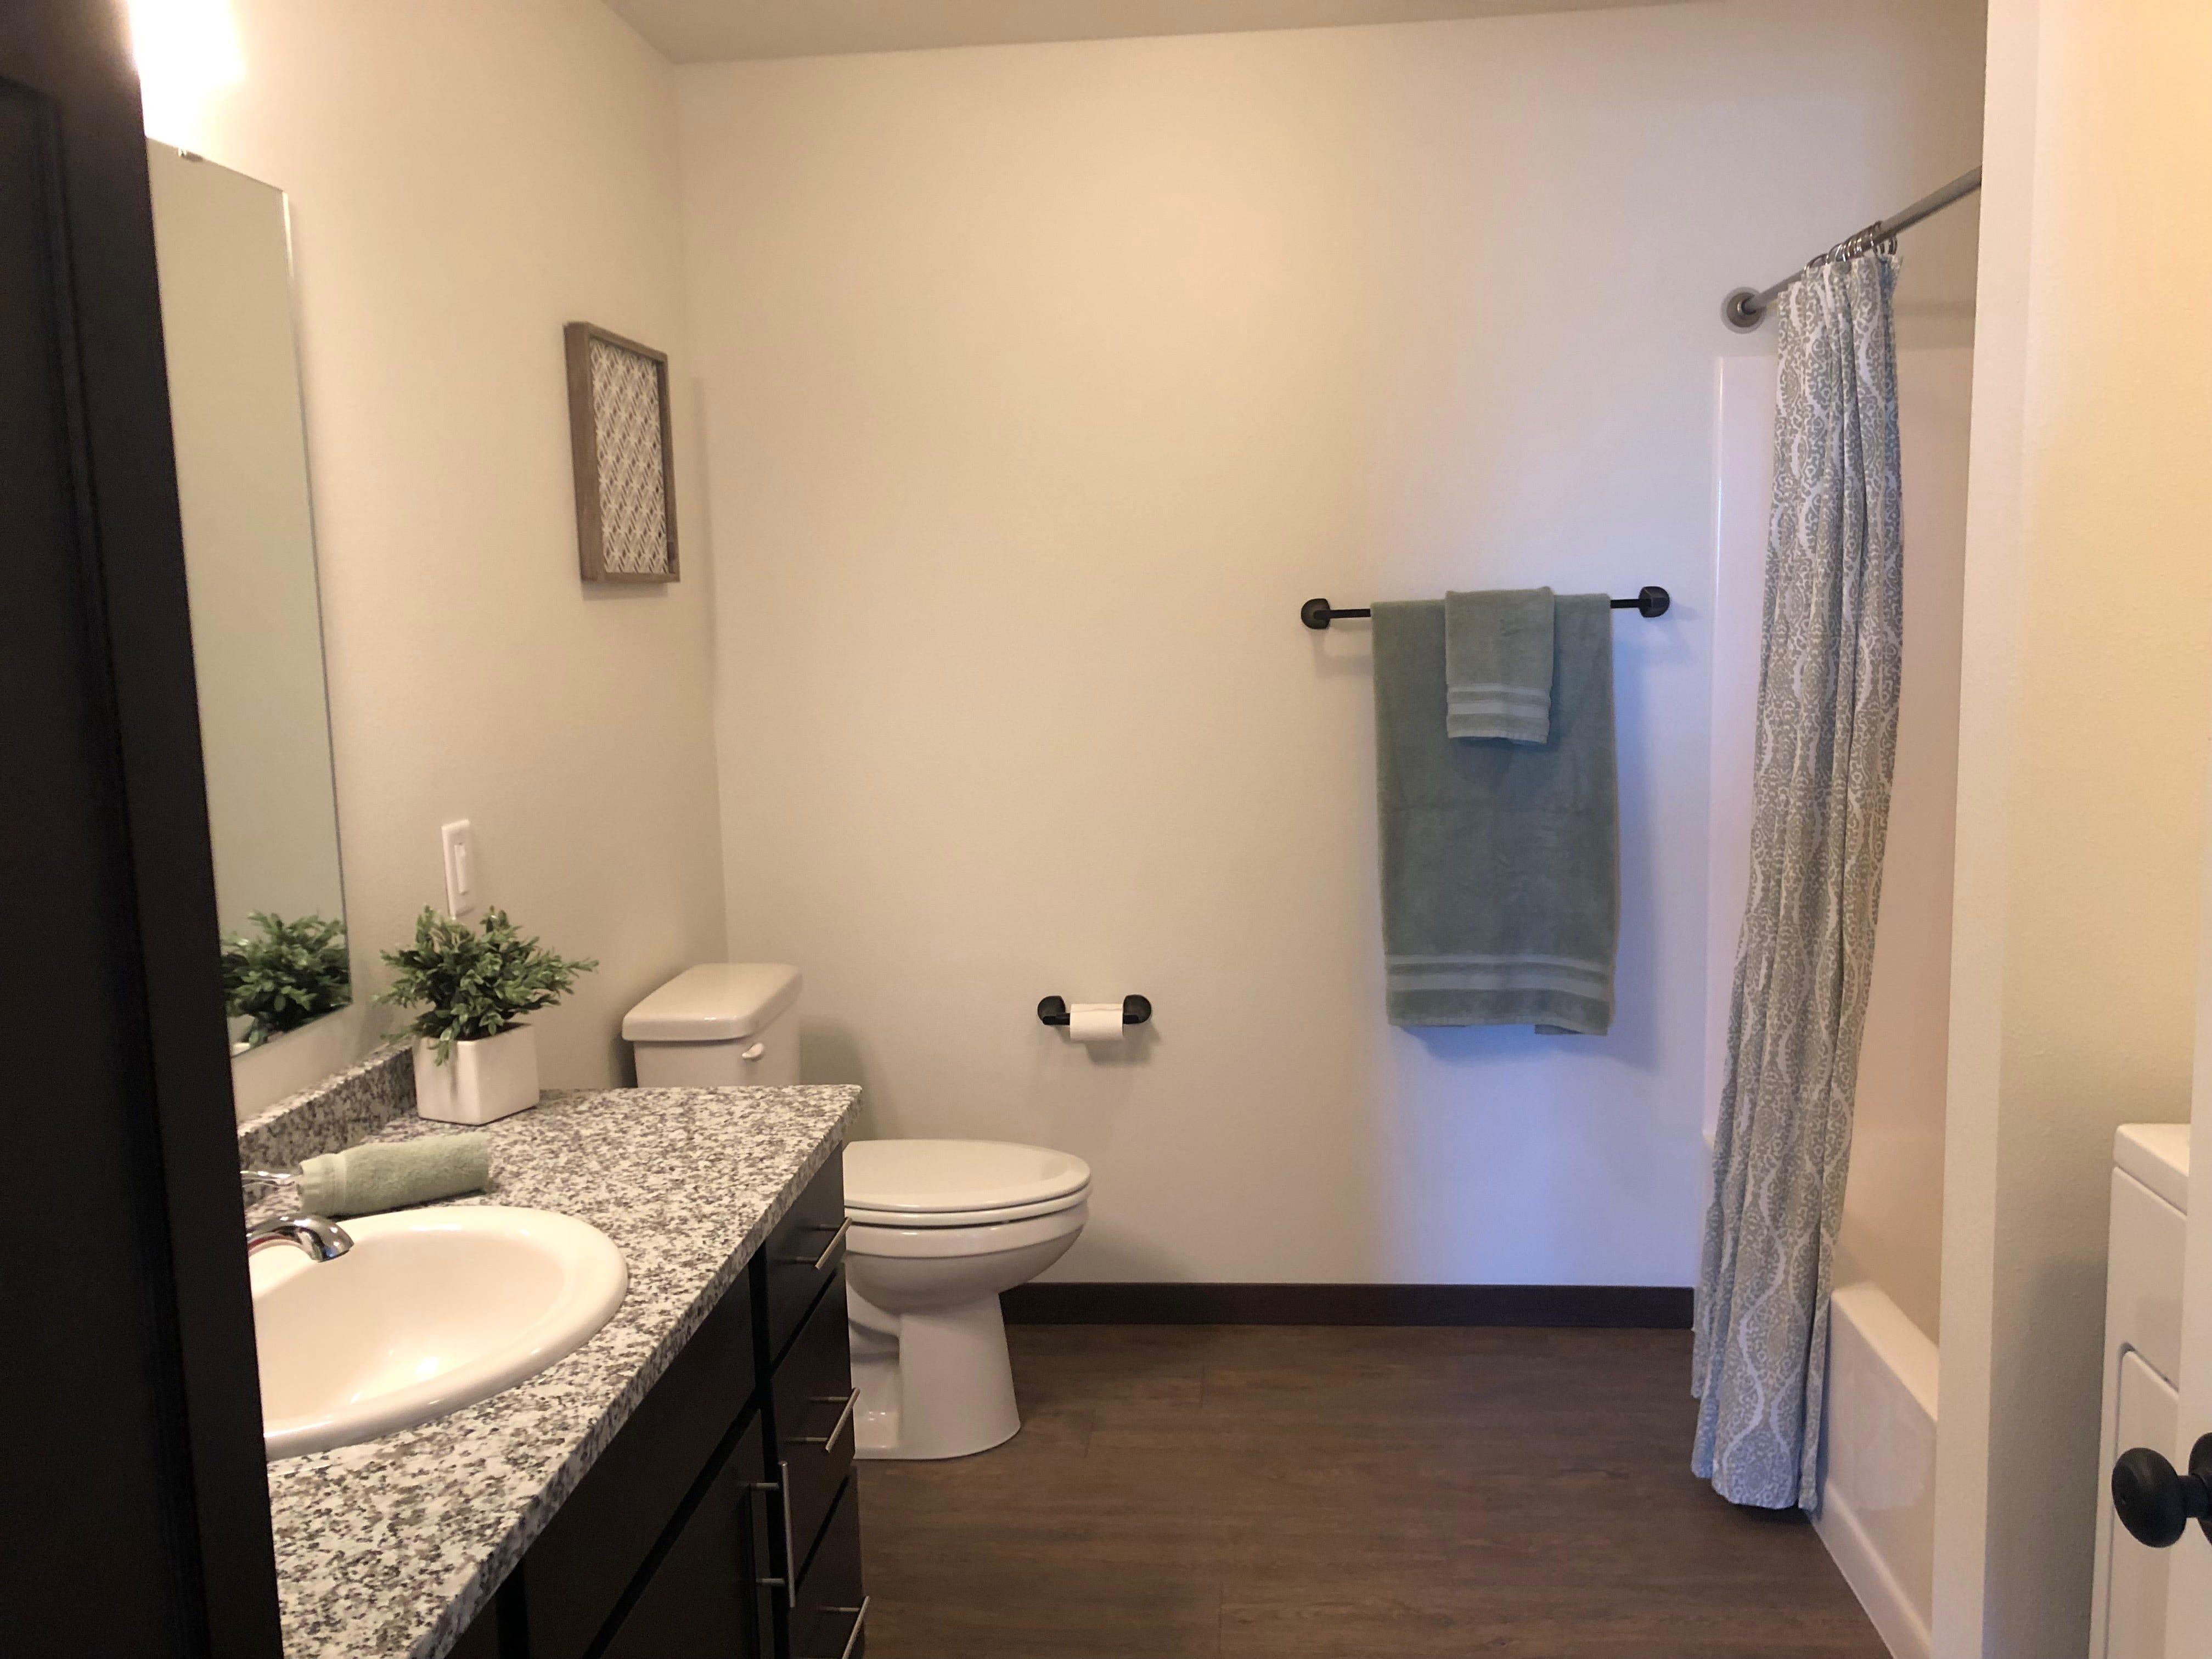 The bathroom of a Westwood Estates apartment.